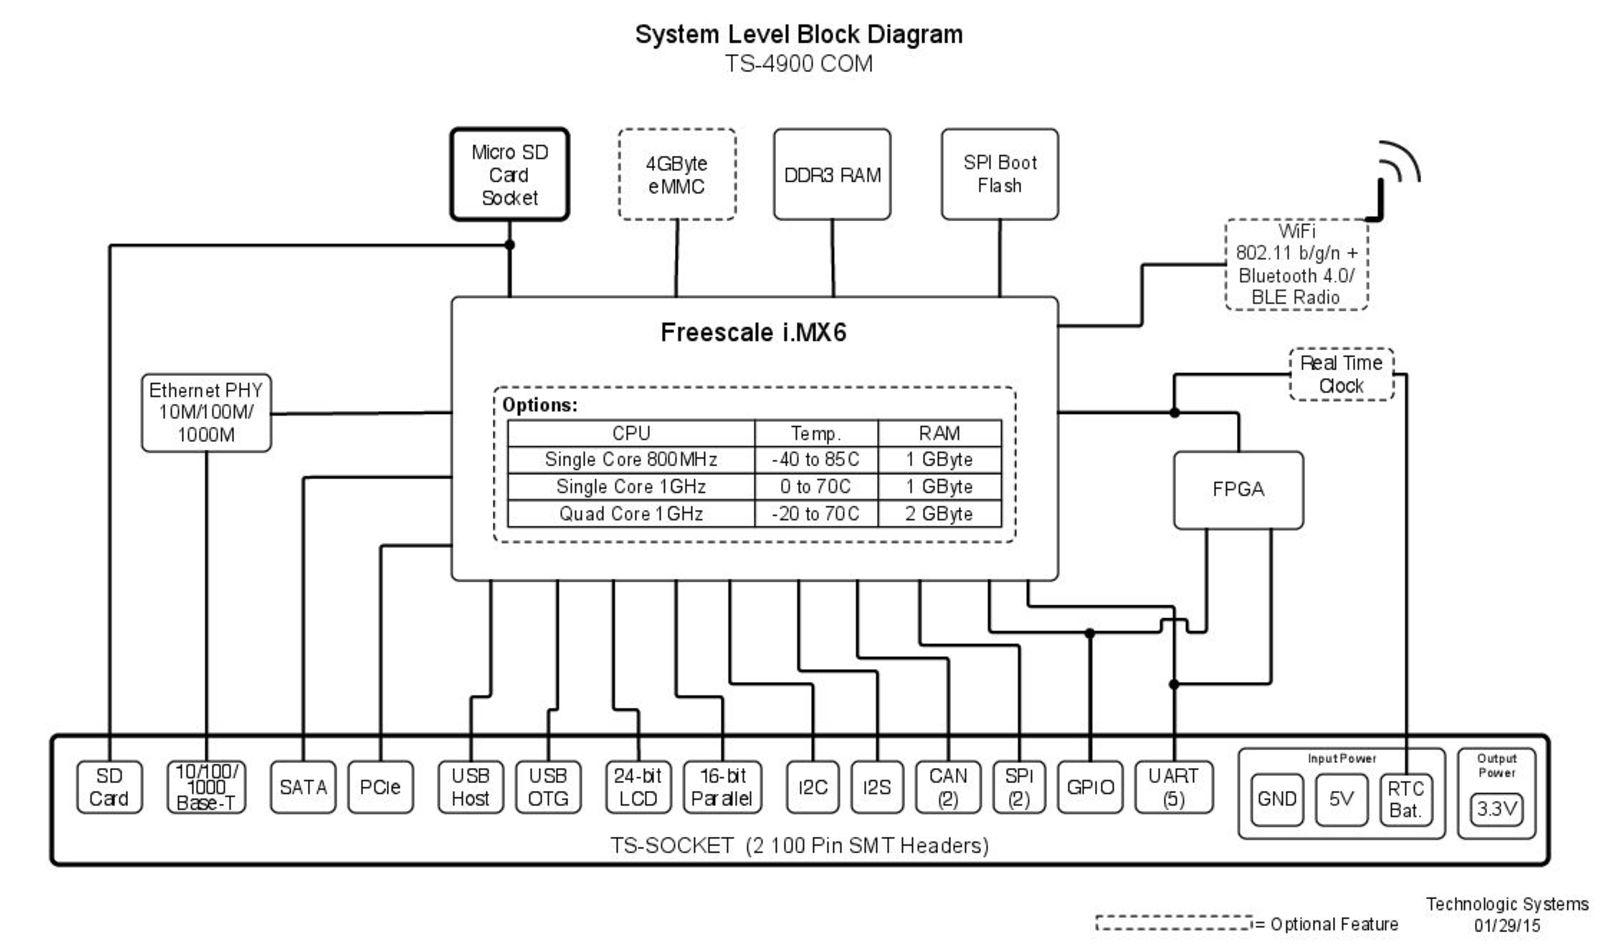 TS-4900 Block Diagram Image